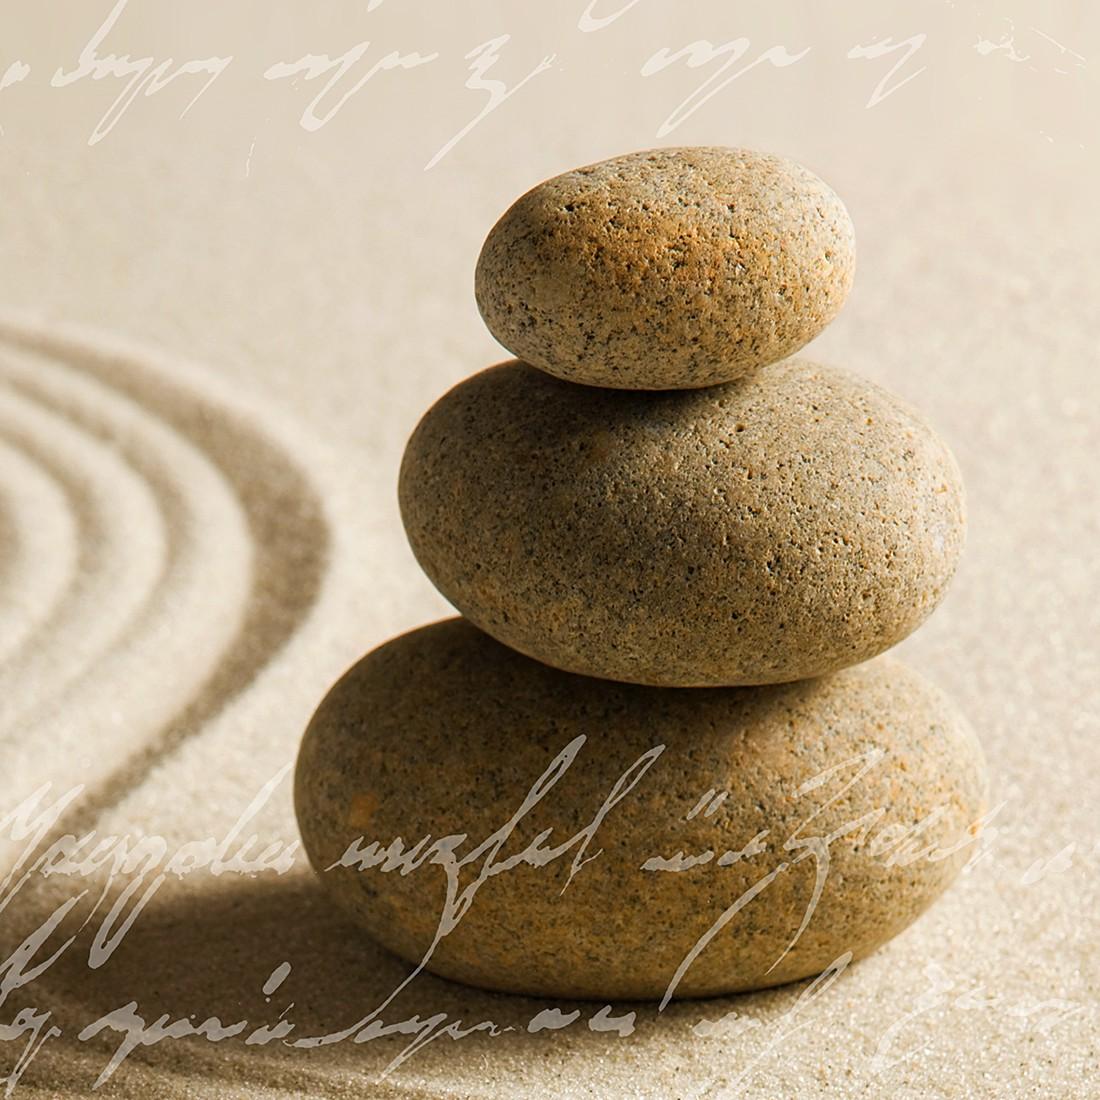 Afbeelding achter glas Sand stone II print achter glas, Pro Art